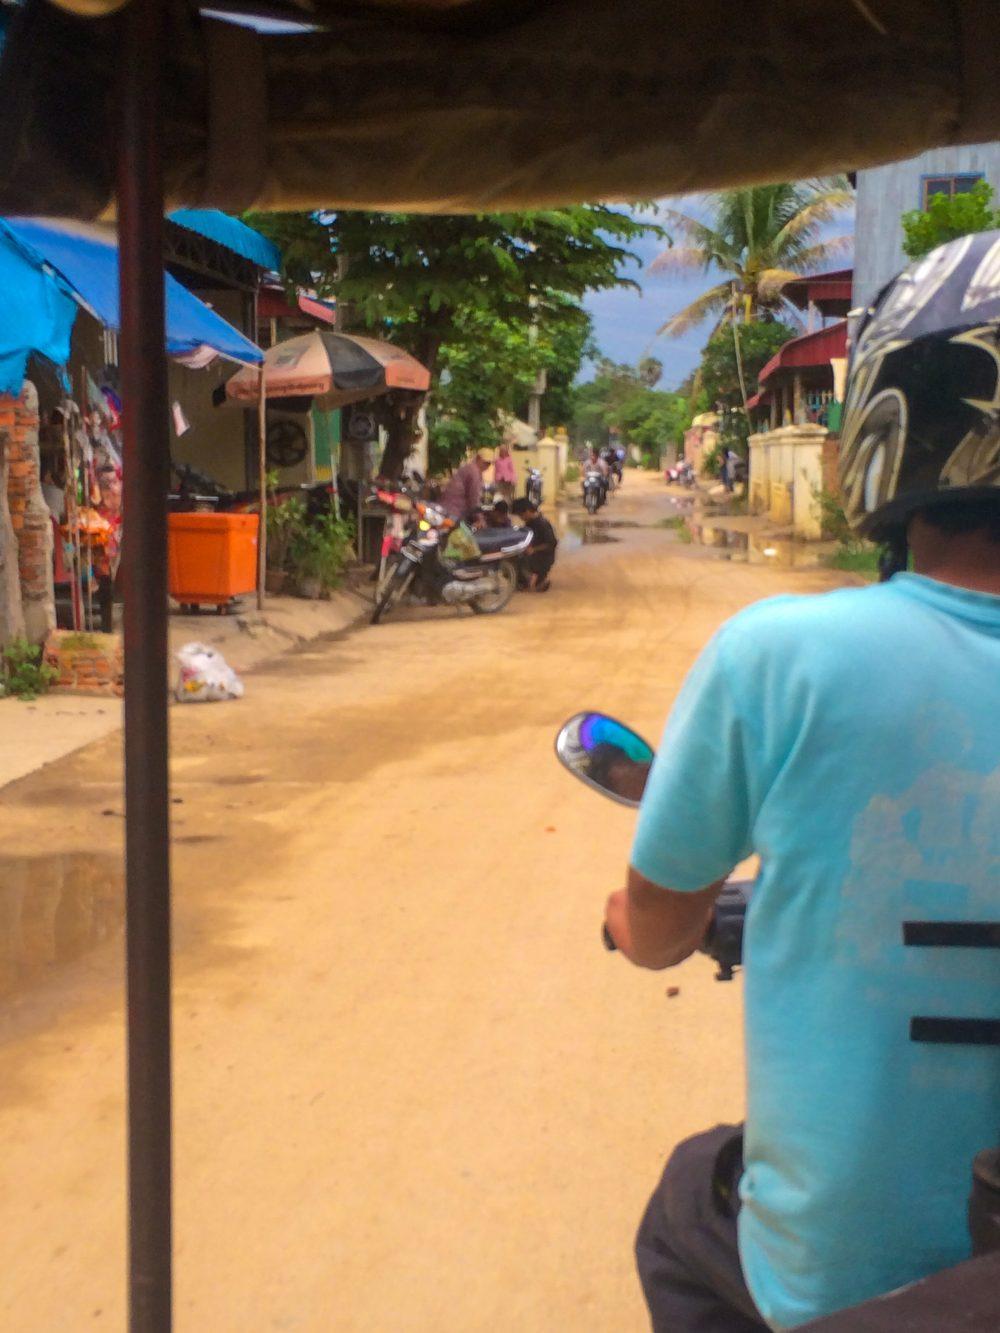 Tuk tuk rides in Phnom Penh